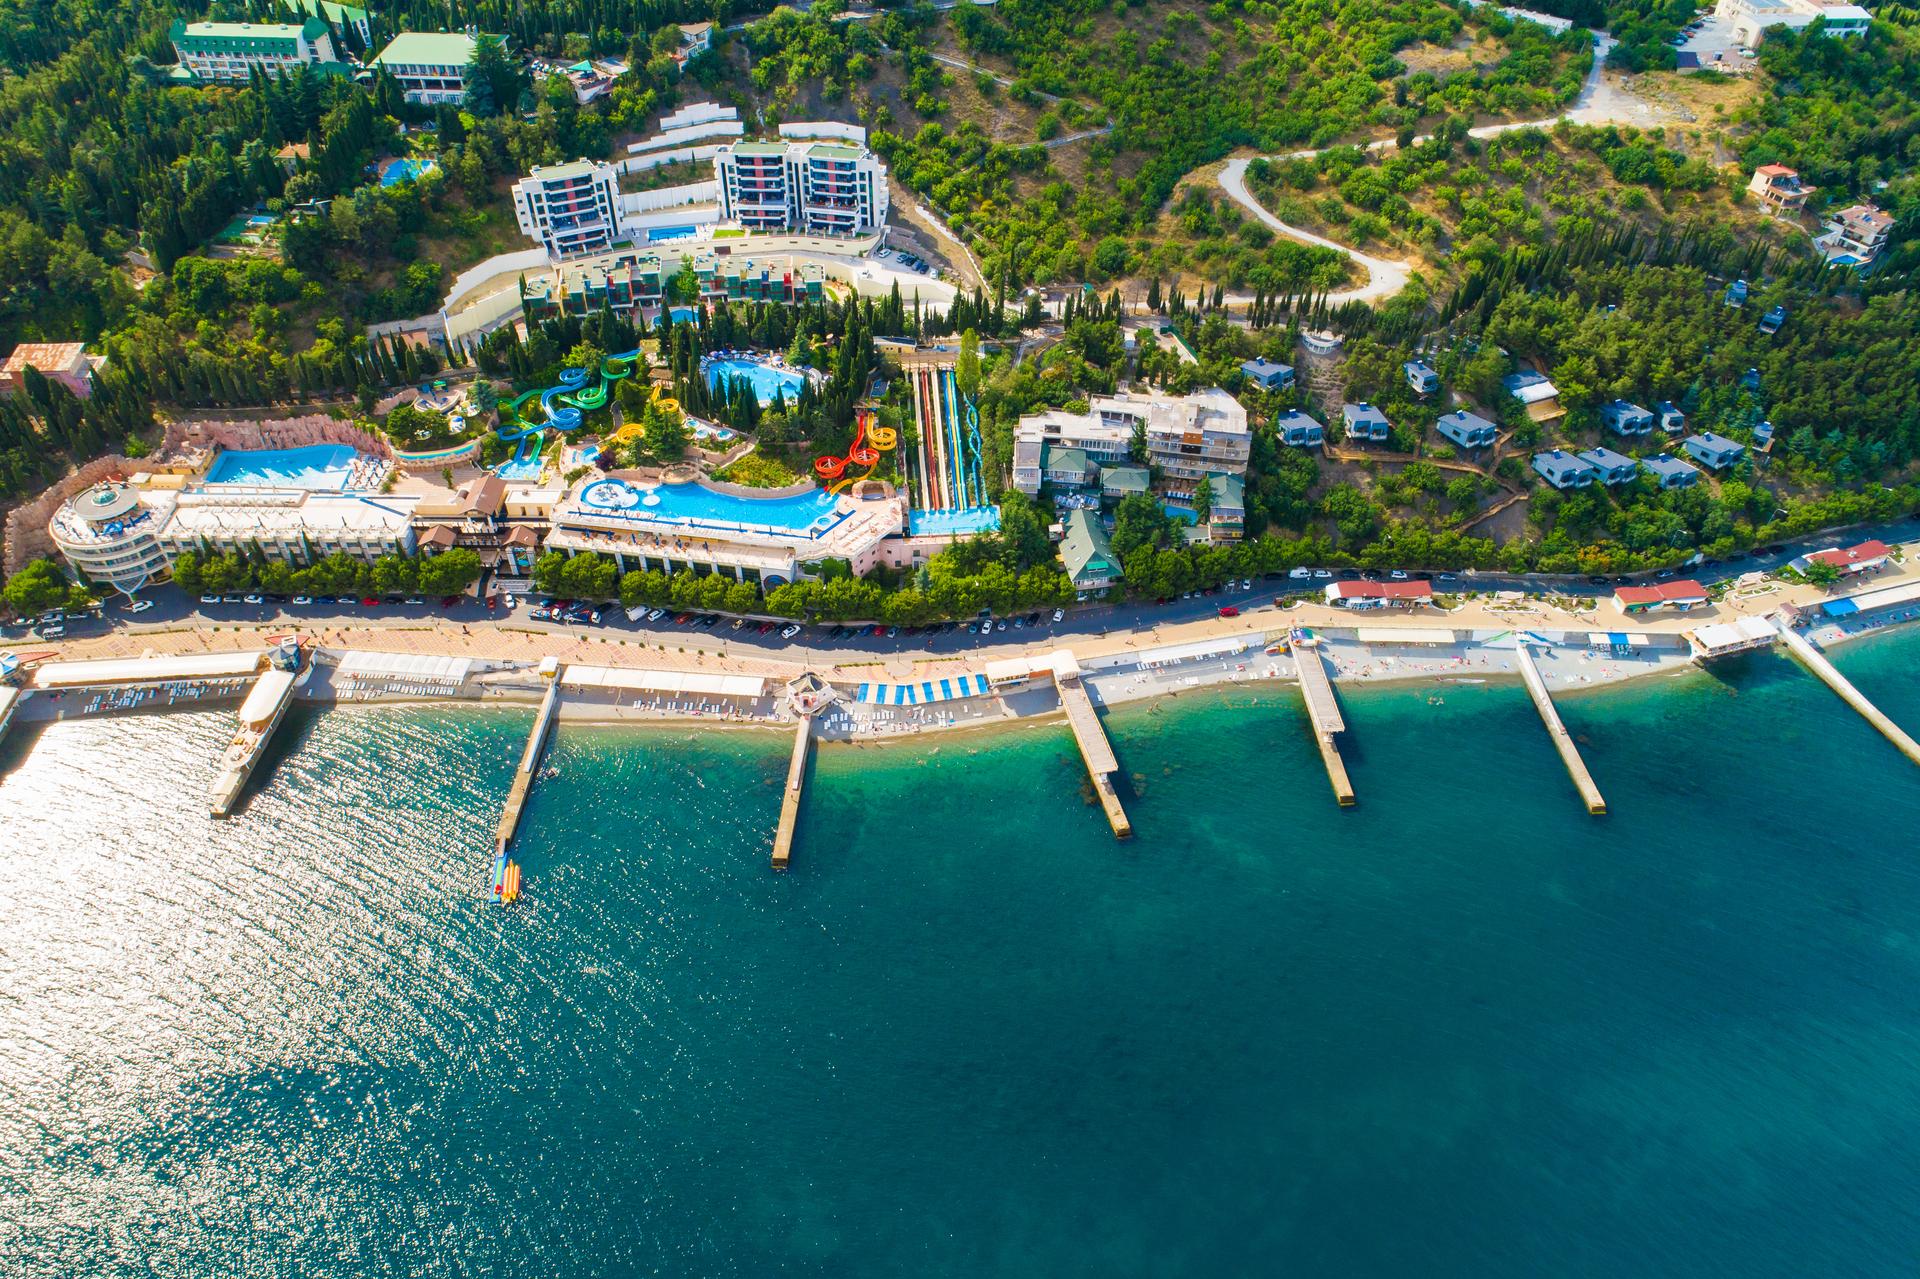 Бассейн в Аквапарк, Крым